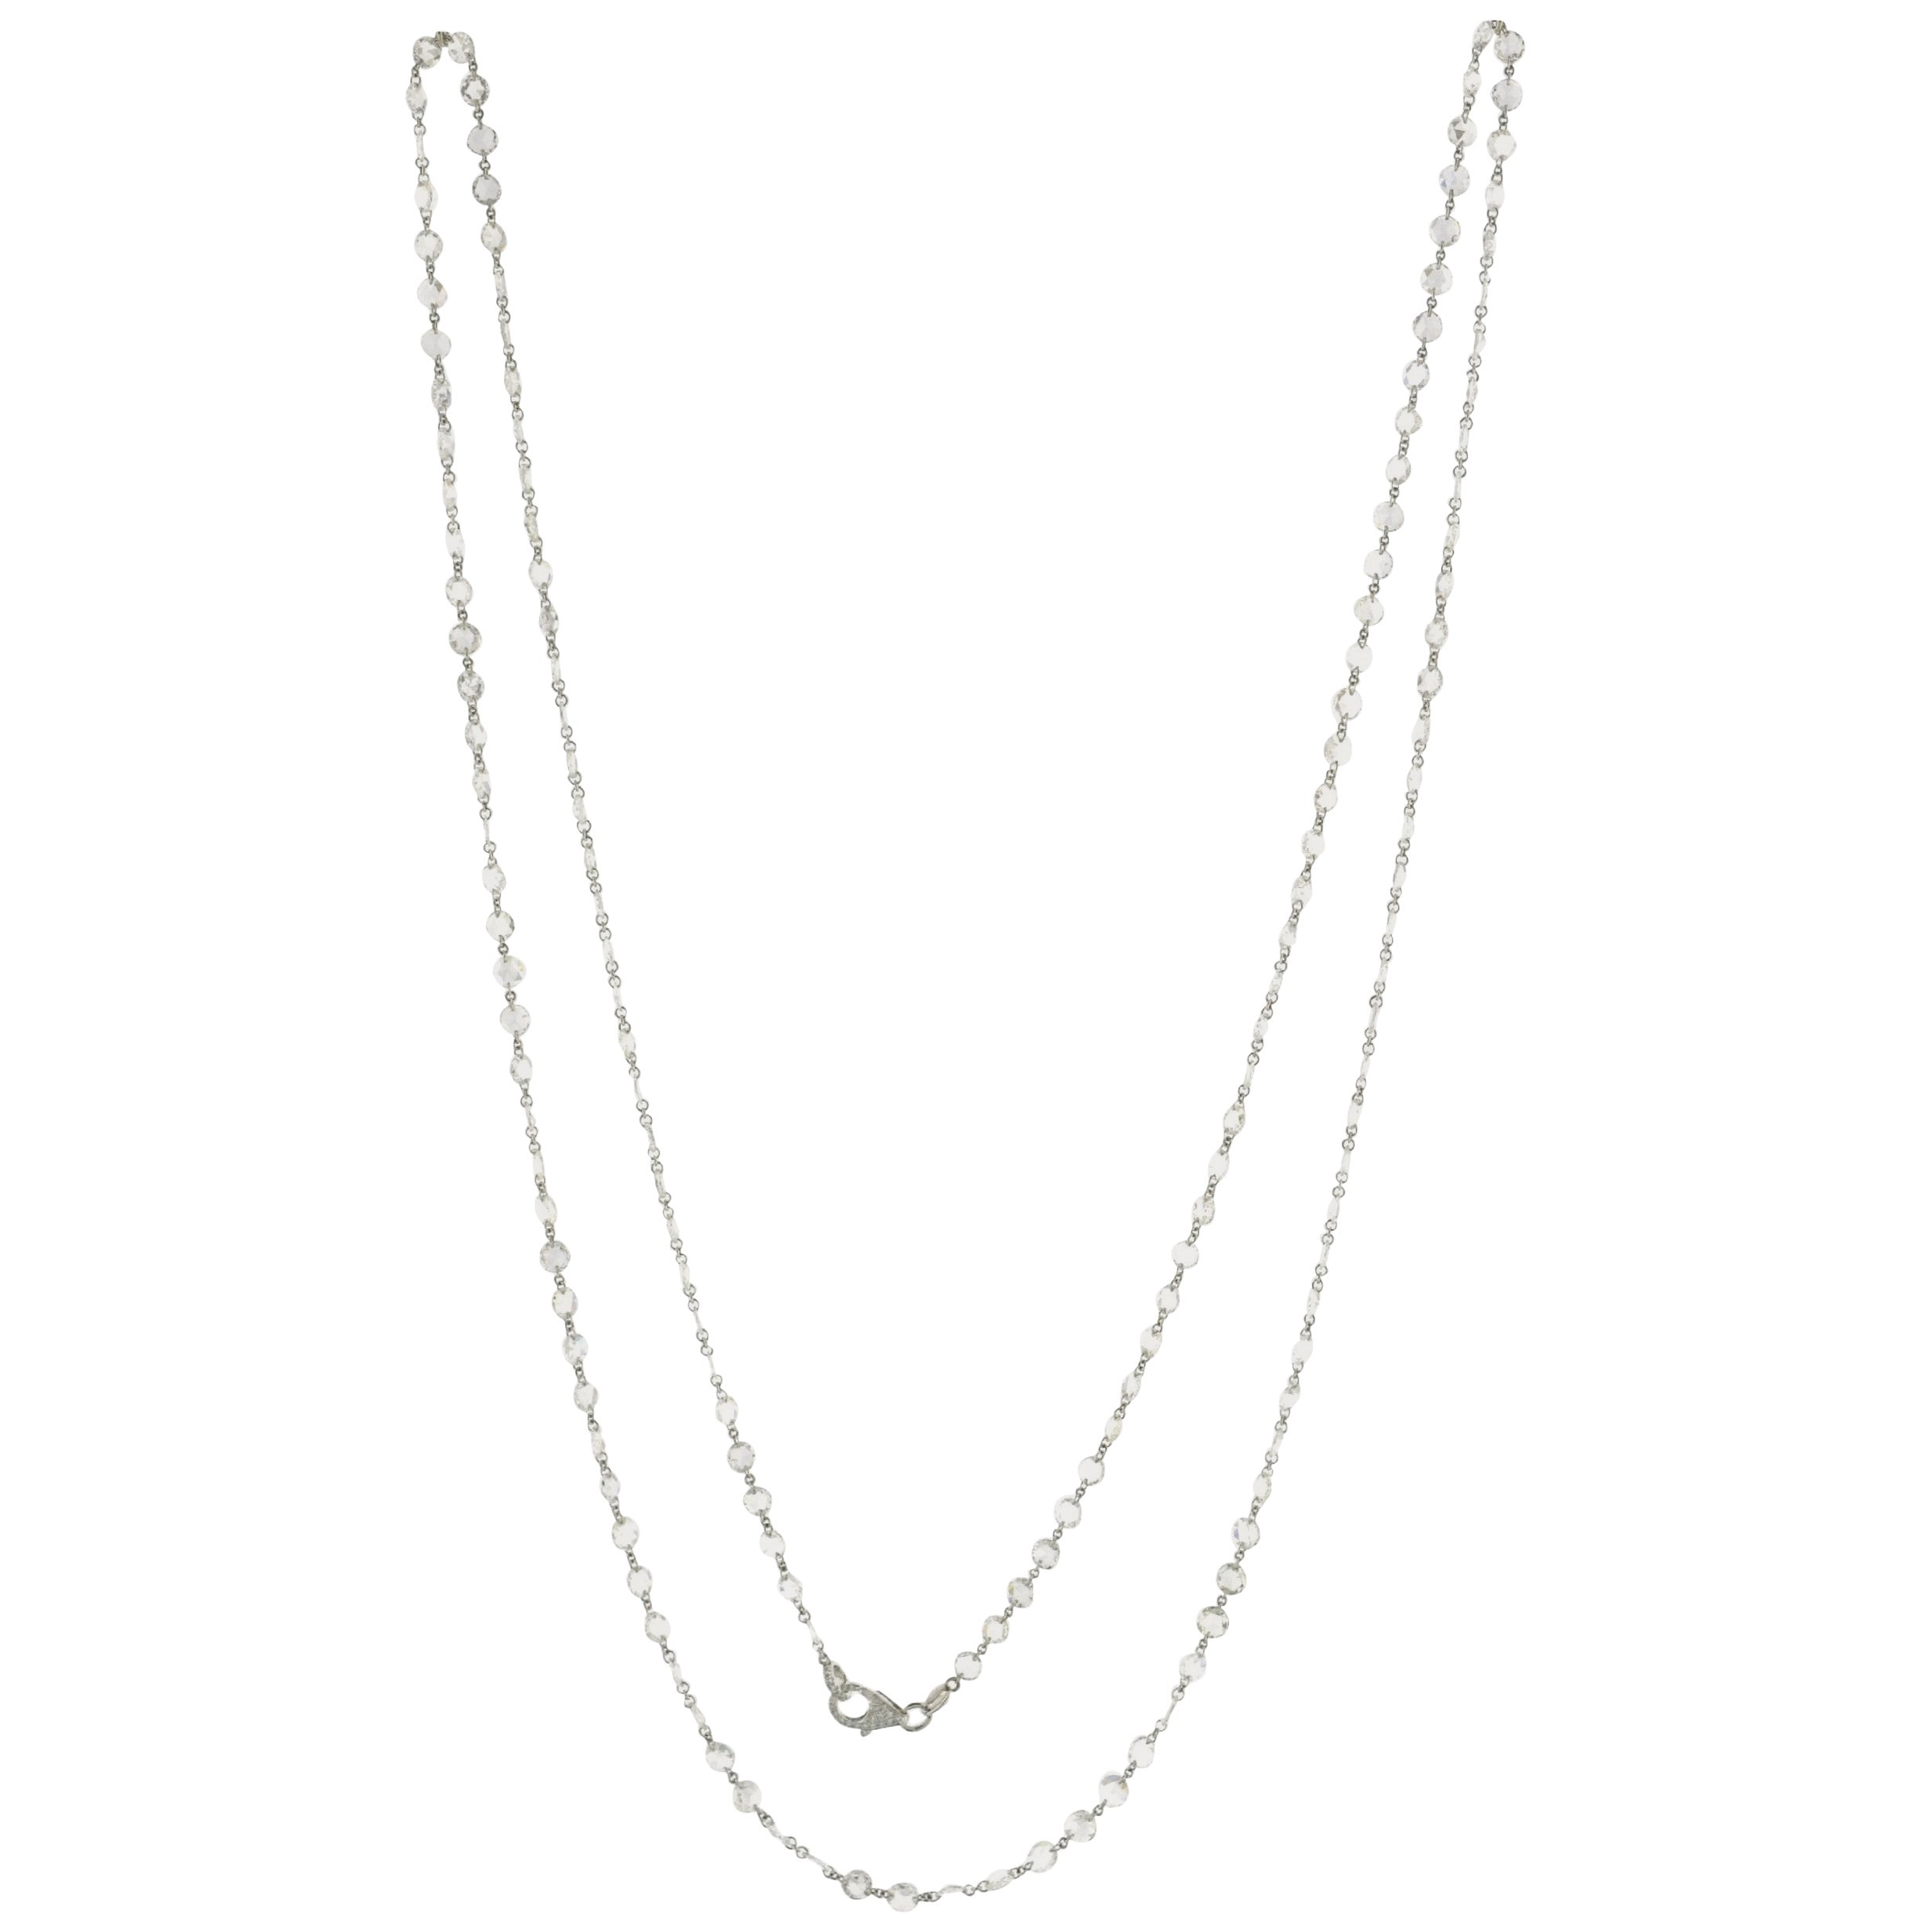 JR 20.78 Carat Rose Cut Diamond 18 Karat White Gold Necklace